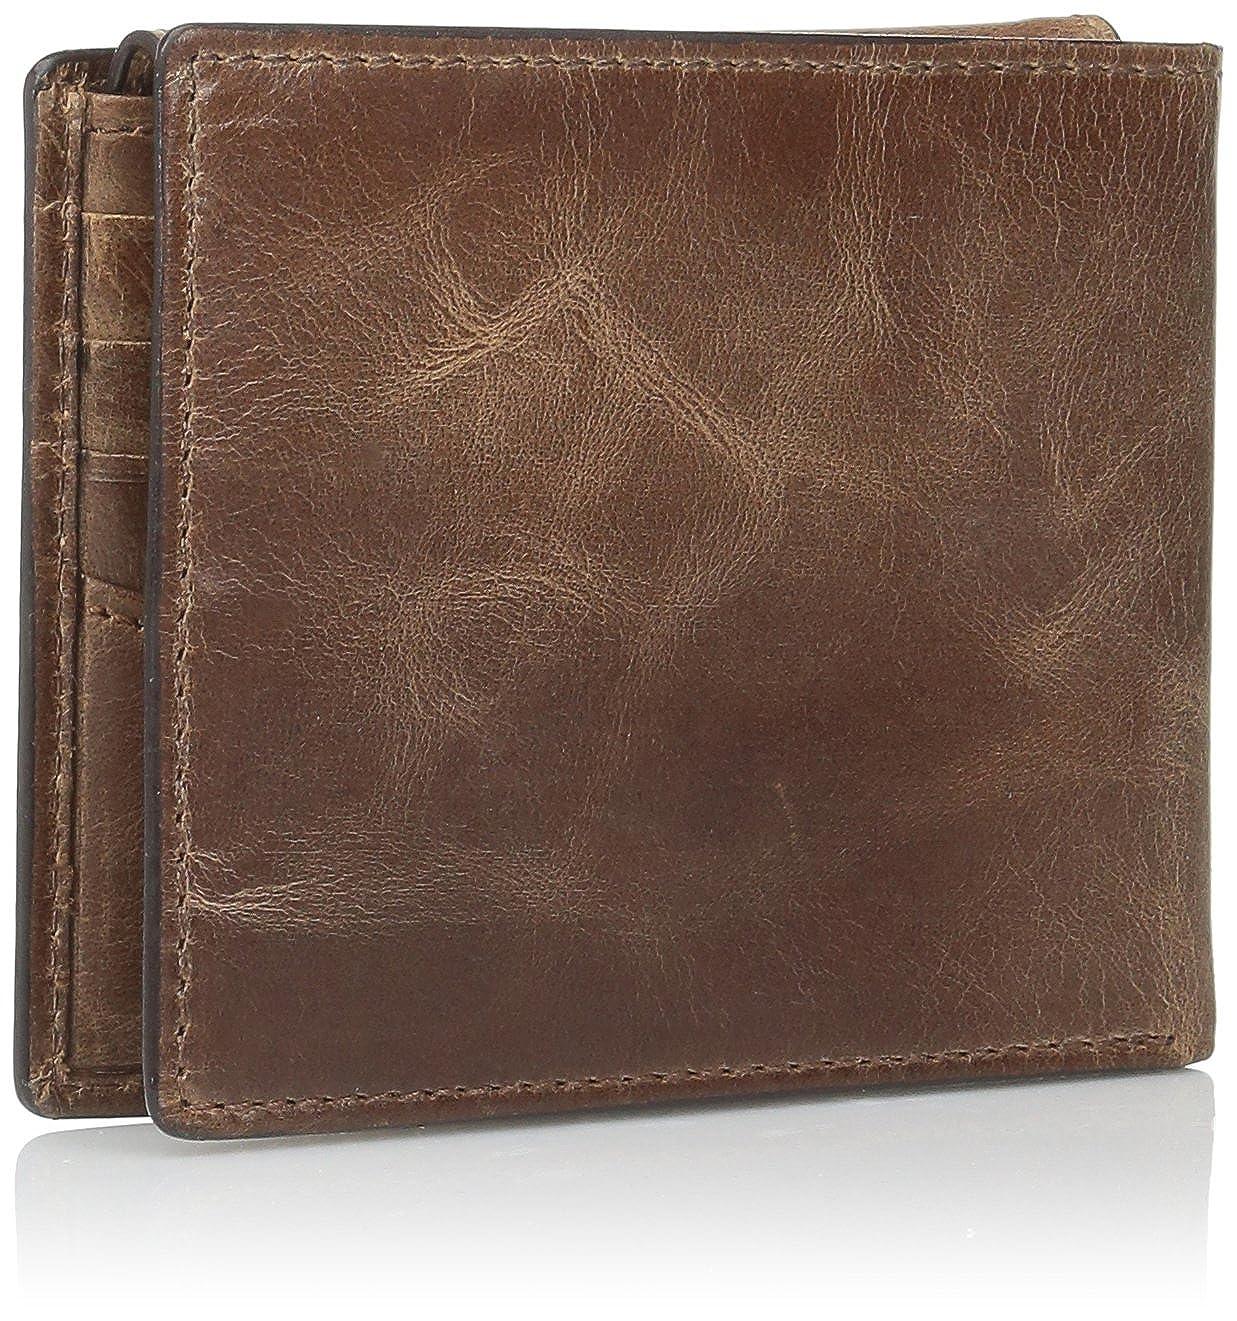 Fossil mens Rfid Derrick Passcase Credit Card Holder